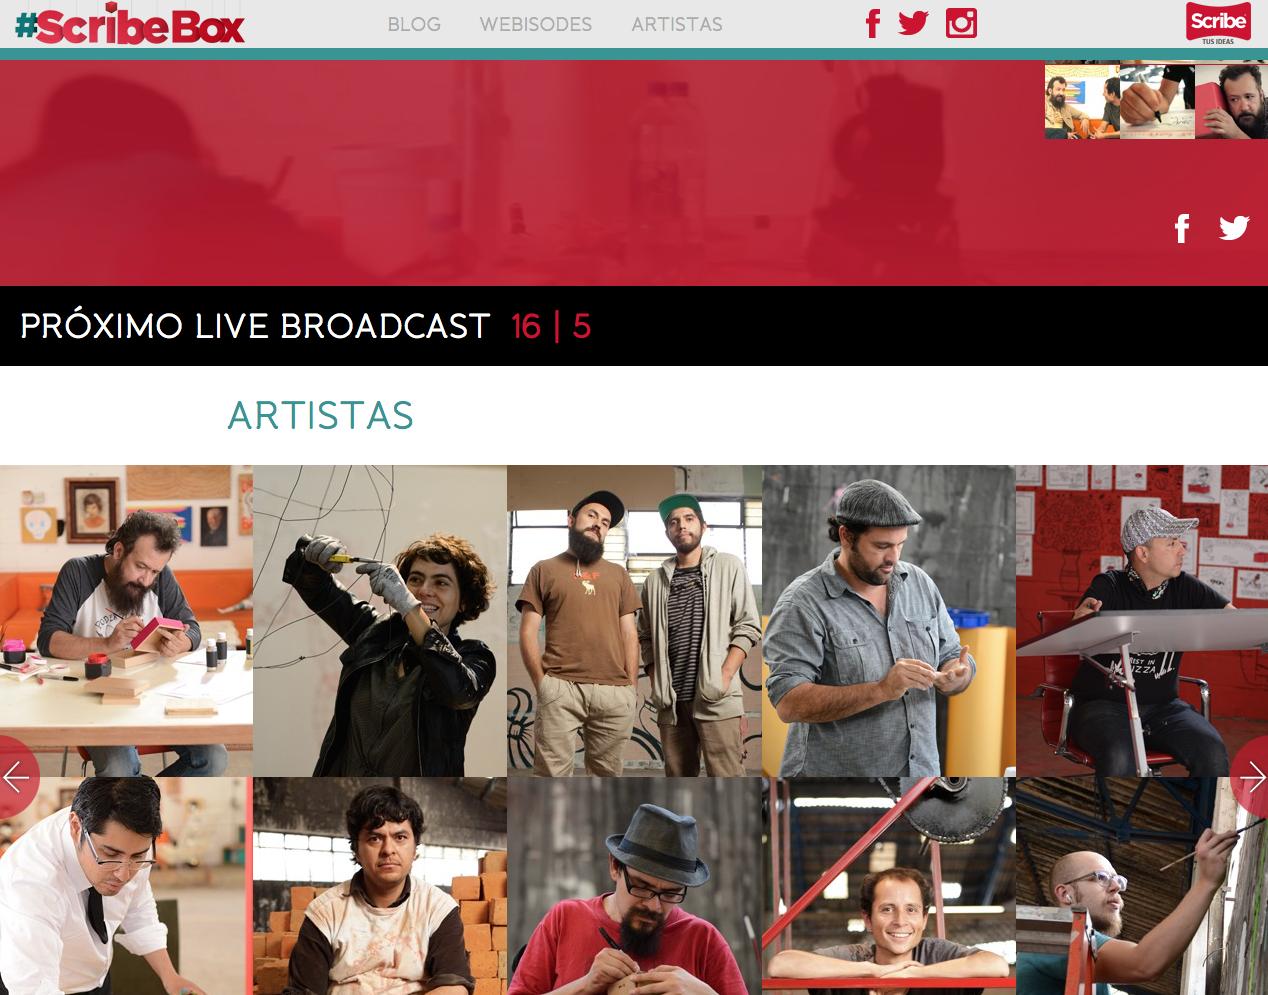 Srcribe box